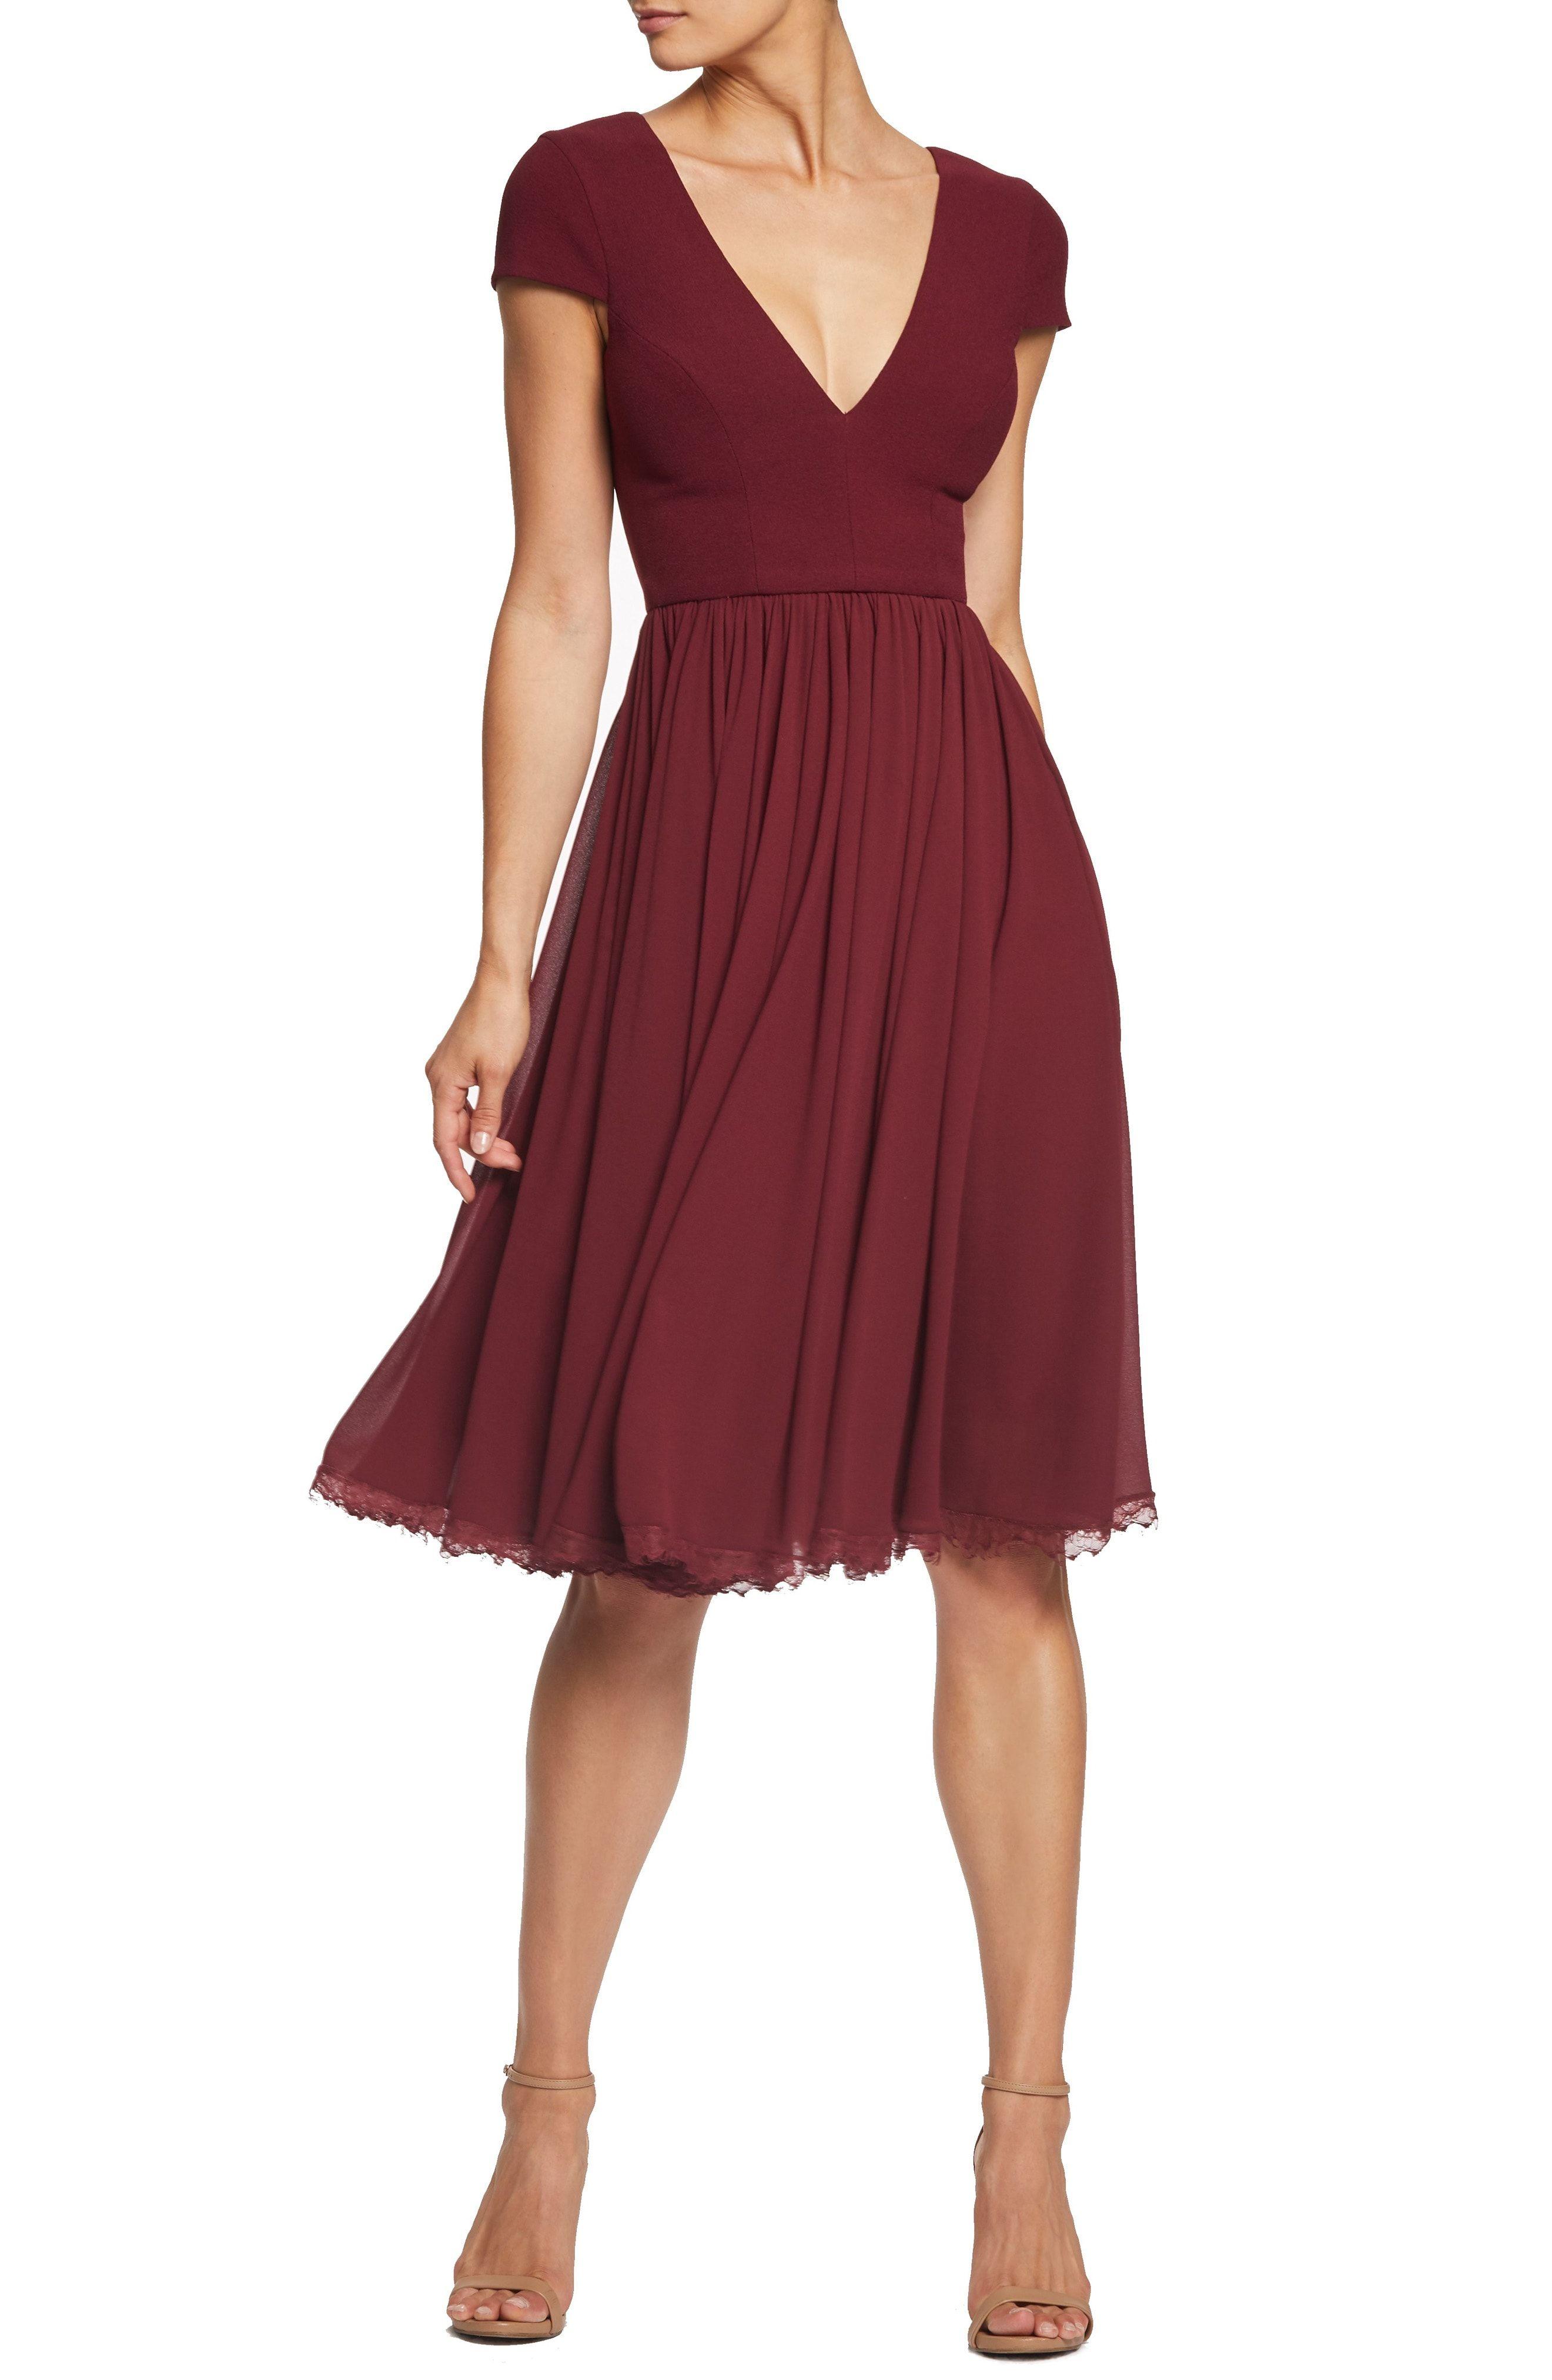 Cute Burgundy Red Dress With Short Sleeves Dress The Population Corey Chiffon Fit Flare Dress A Fit And Flare Cocktail Dress Fit Flare Dress Flare Dress [ 4048 x 2640 Pixel ]